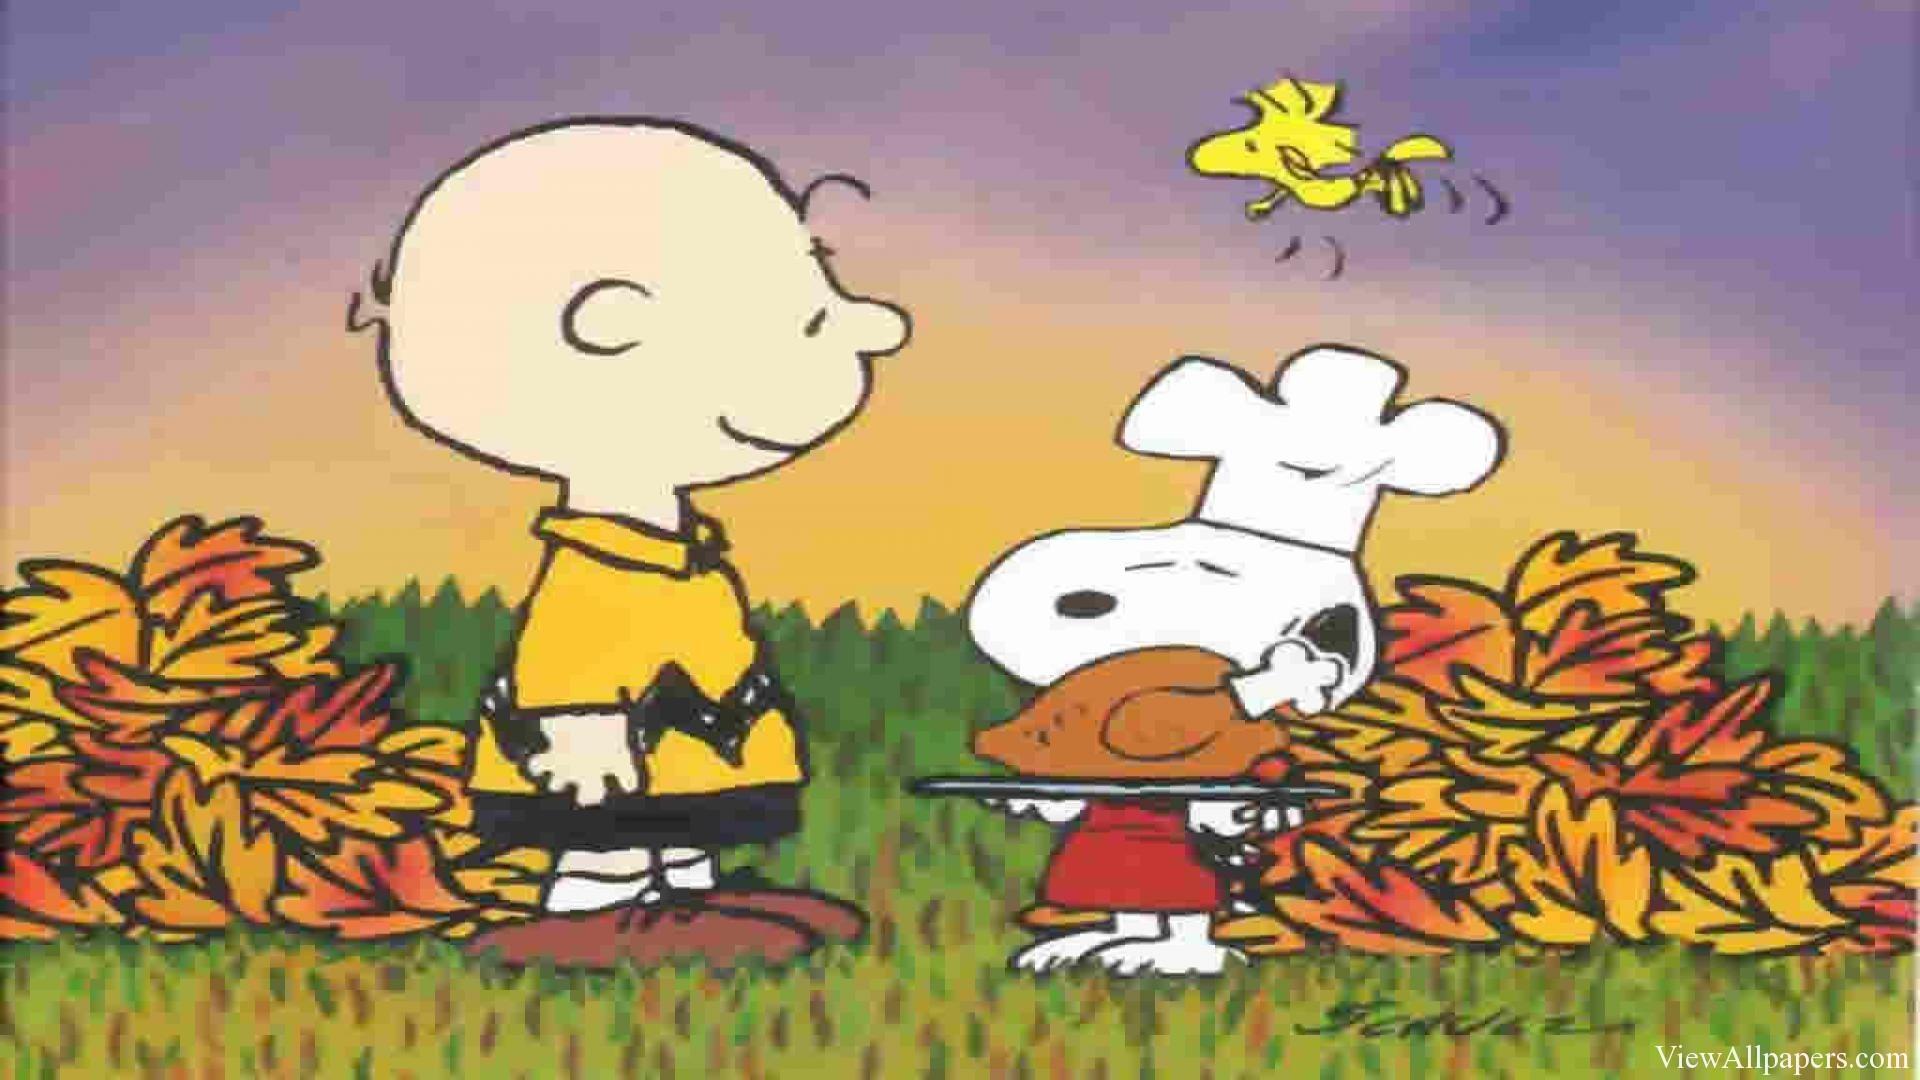 Charlie Brown Wallpaper   Cartoon & Animation HD Wallpapers